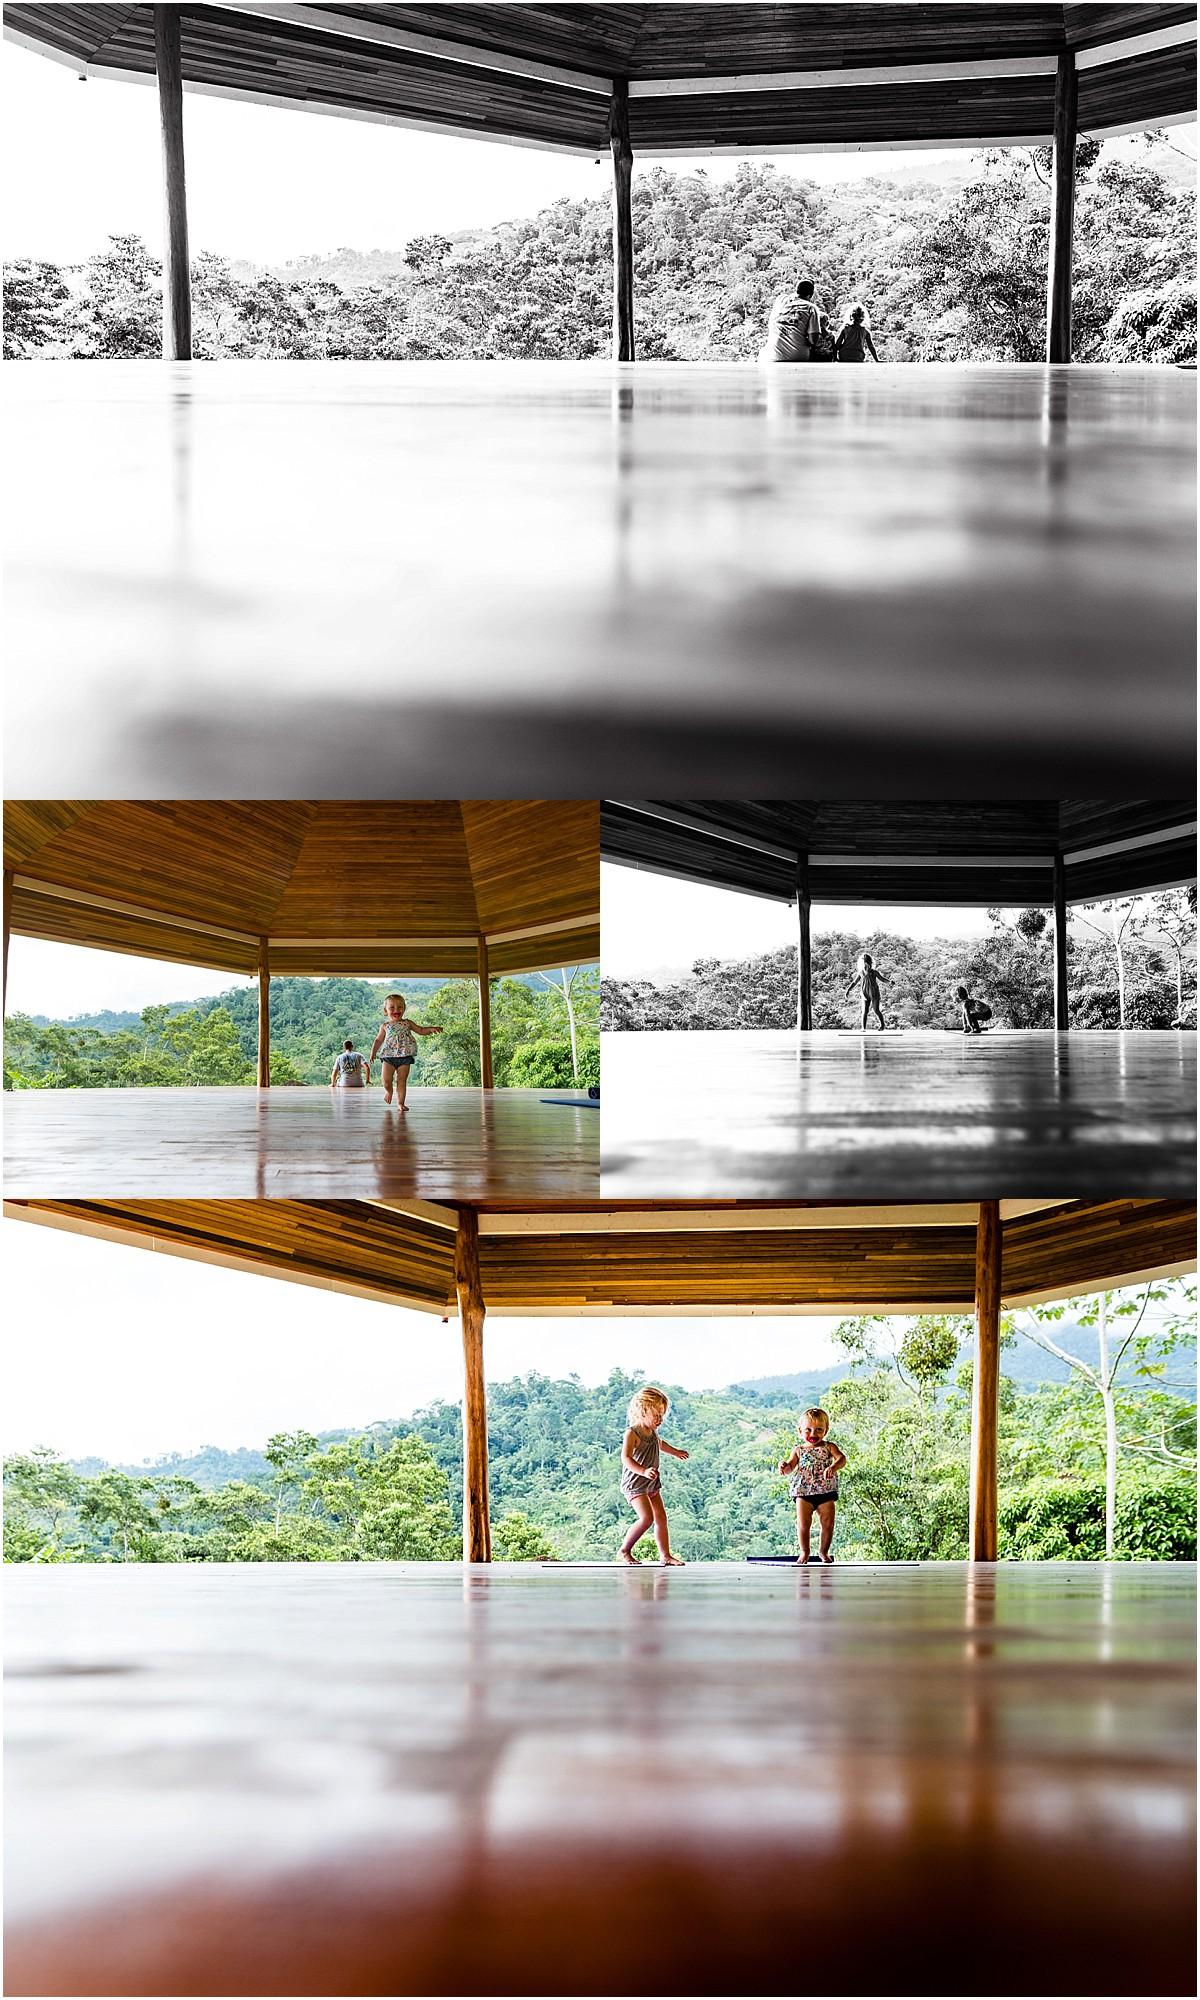 Ashley_Rogers_Photography_South_Florida_Photographer_Orlando_Photographer_Costa_Rica_Photographer_1211.jpg